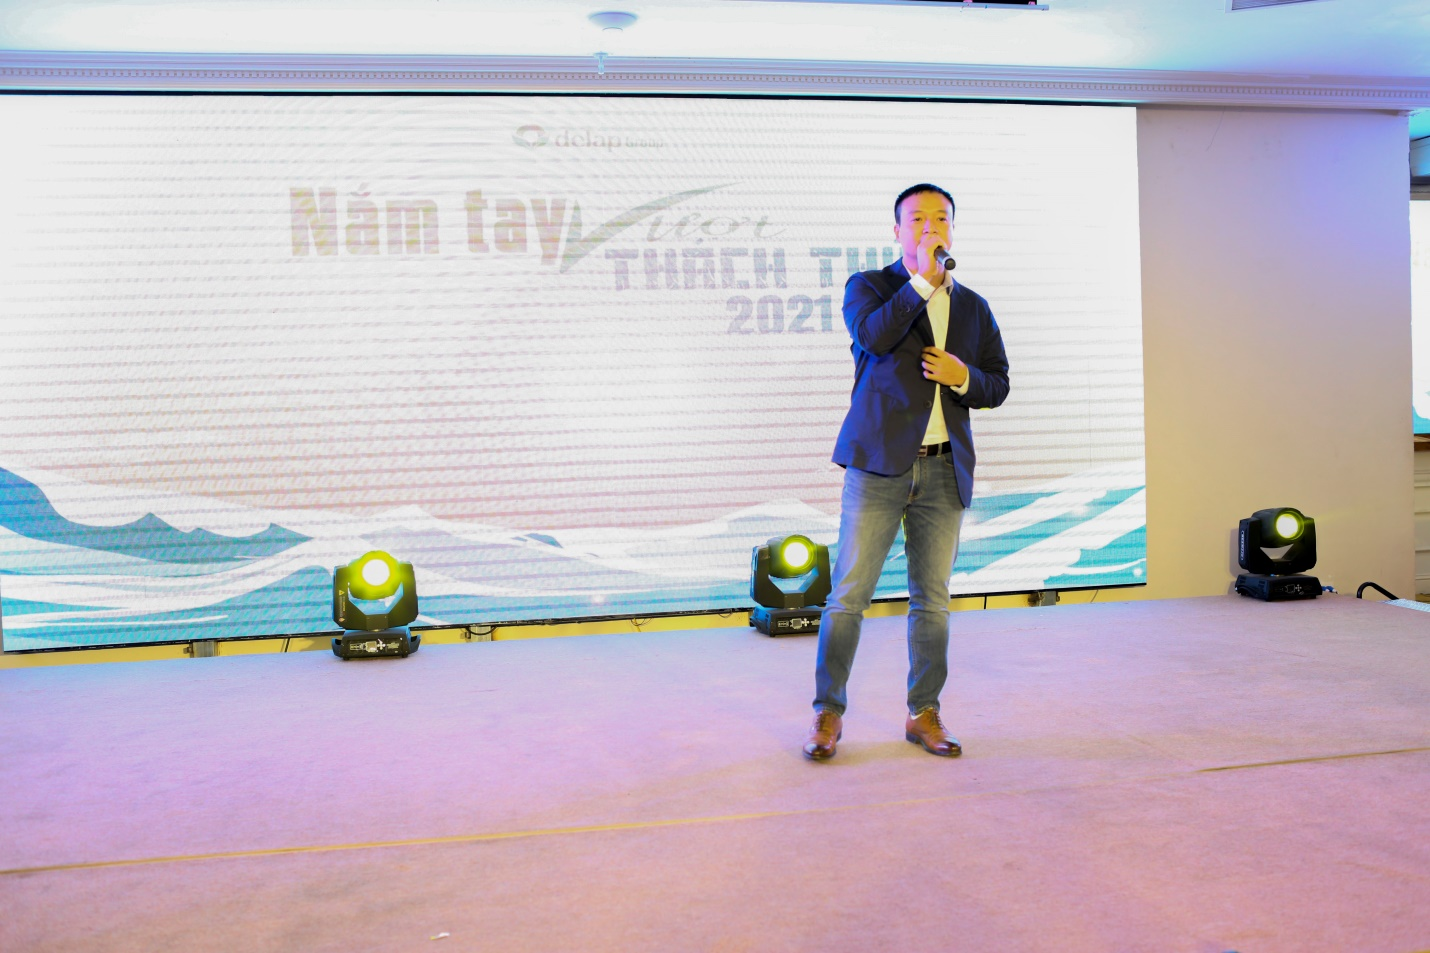 Z:\Marketing\MKT General\2021\SỰ KIỆN CÔNG TY\Year end party 2020\Ảnh\Canon\IMG_0896.jpg